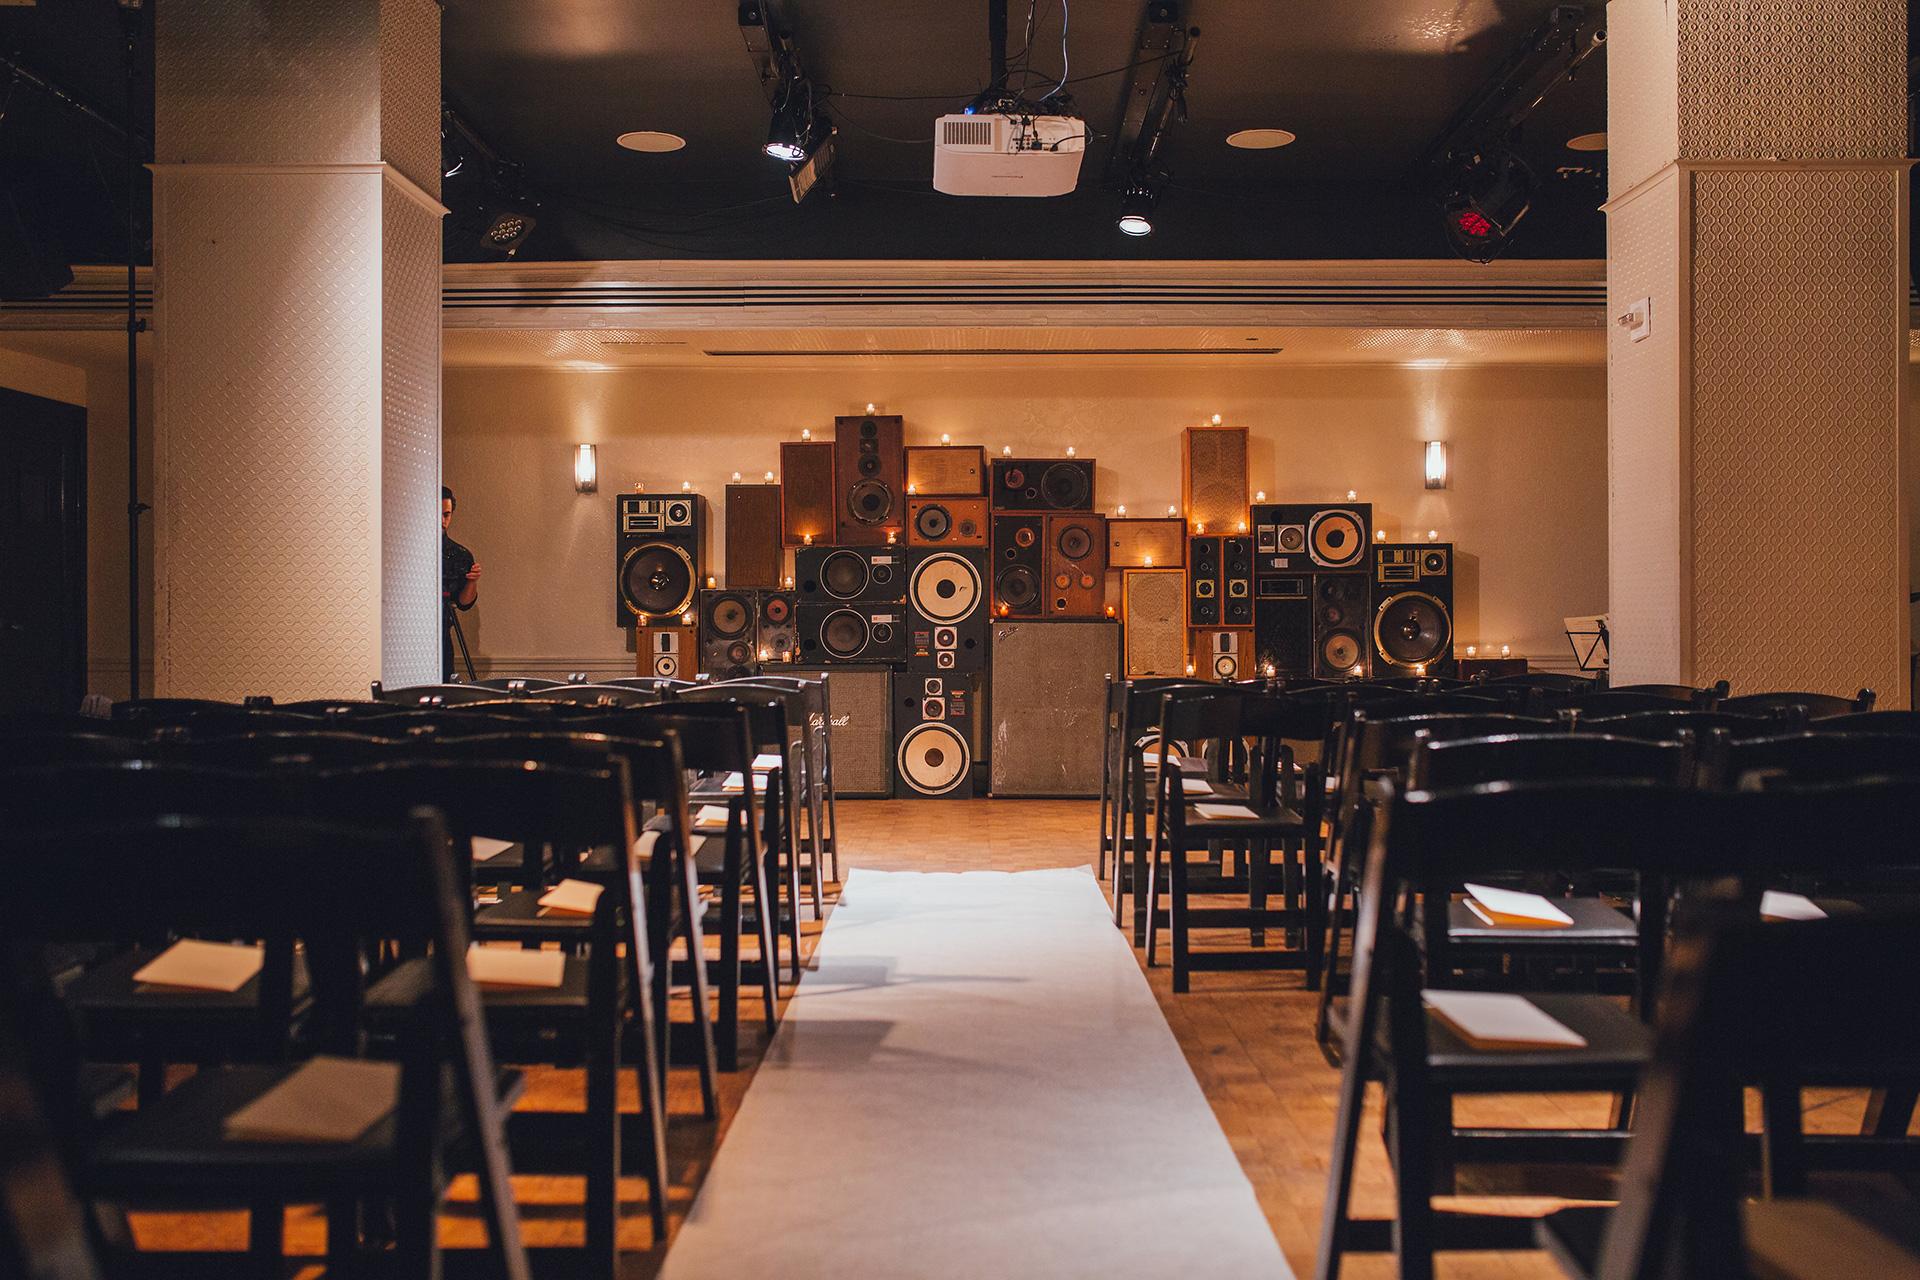 wedding venue black folding chairs speaker display